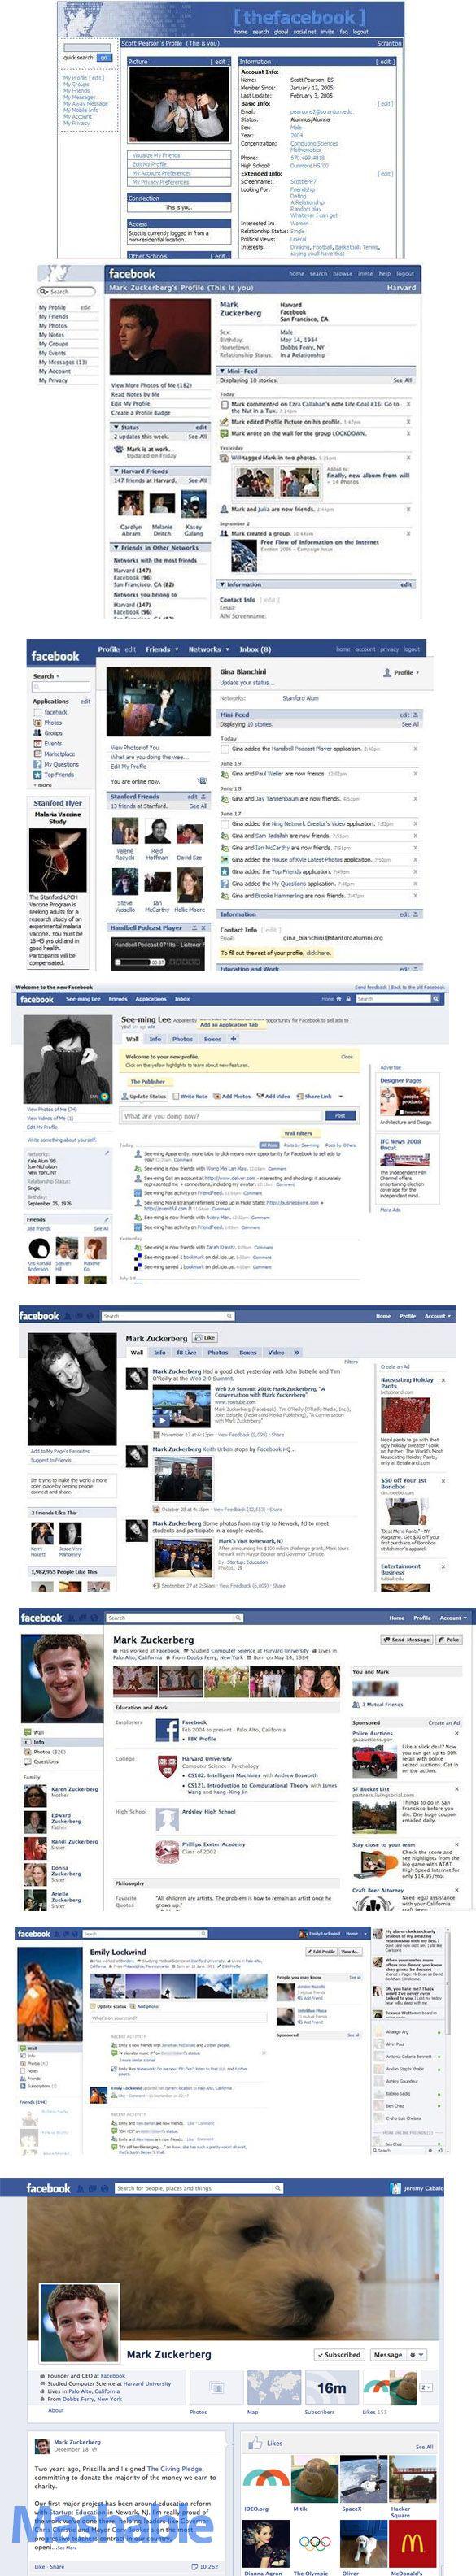 Evolution of the Facebook Profile